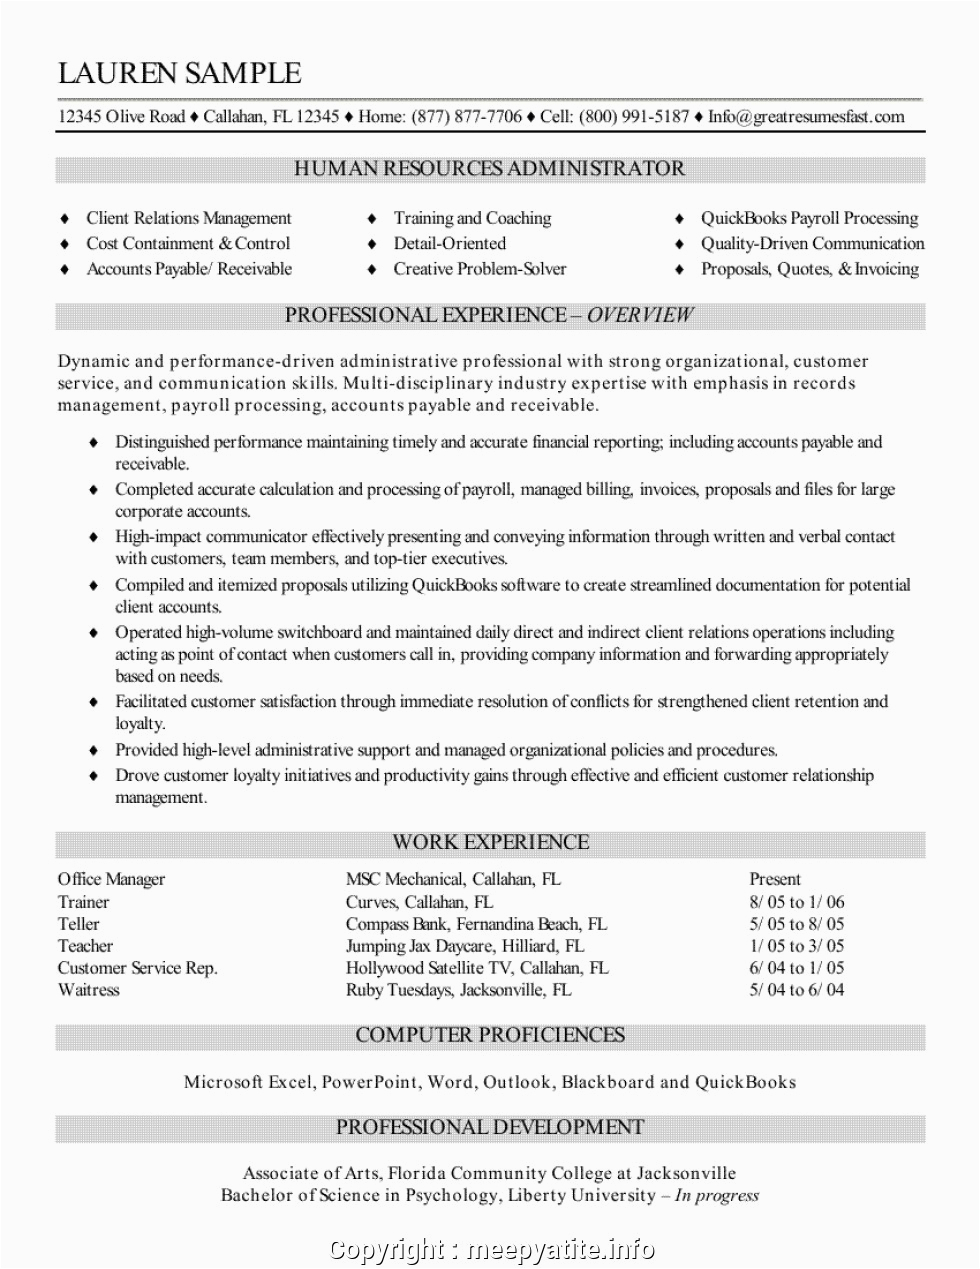 Sample Resume for Experienced Hr Recruiter Print Resume format for Experienced Hr Recruiter Great